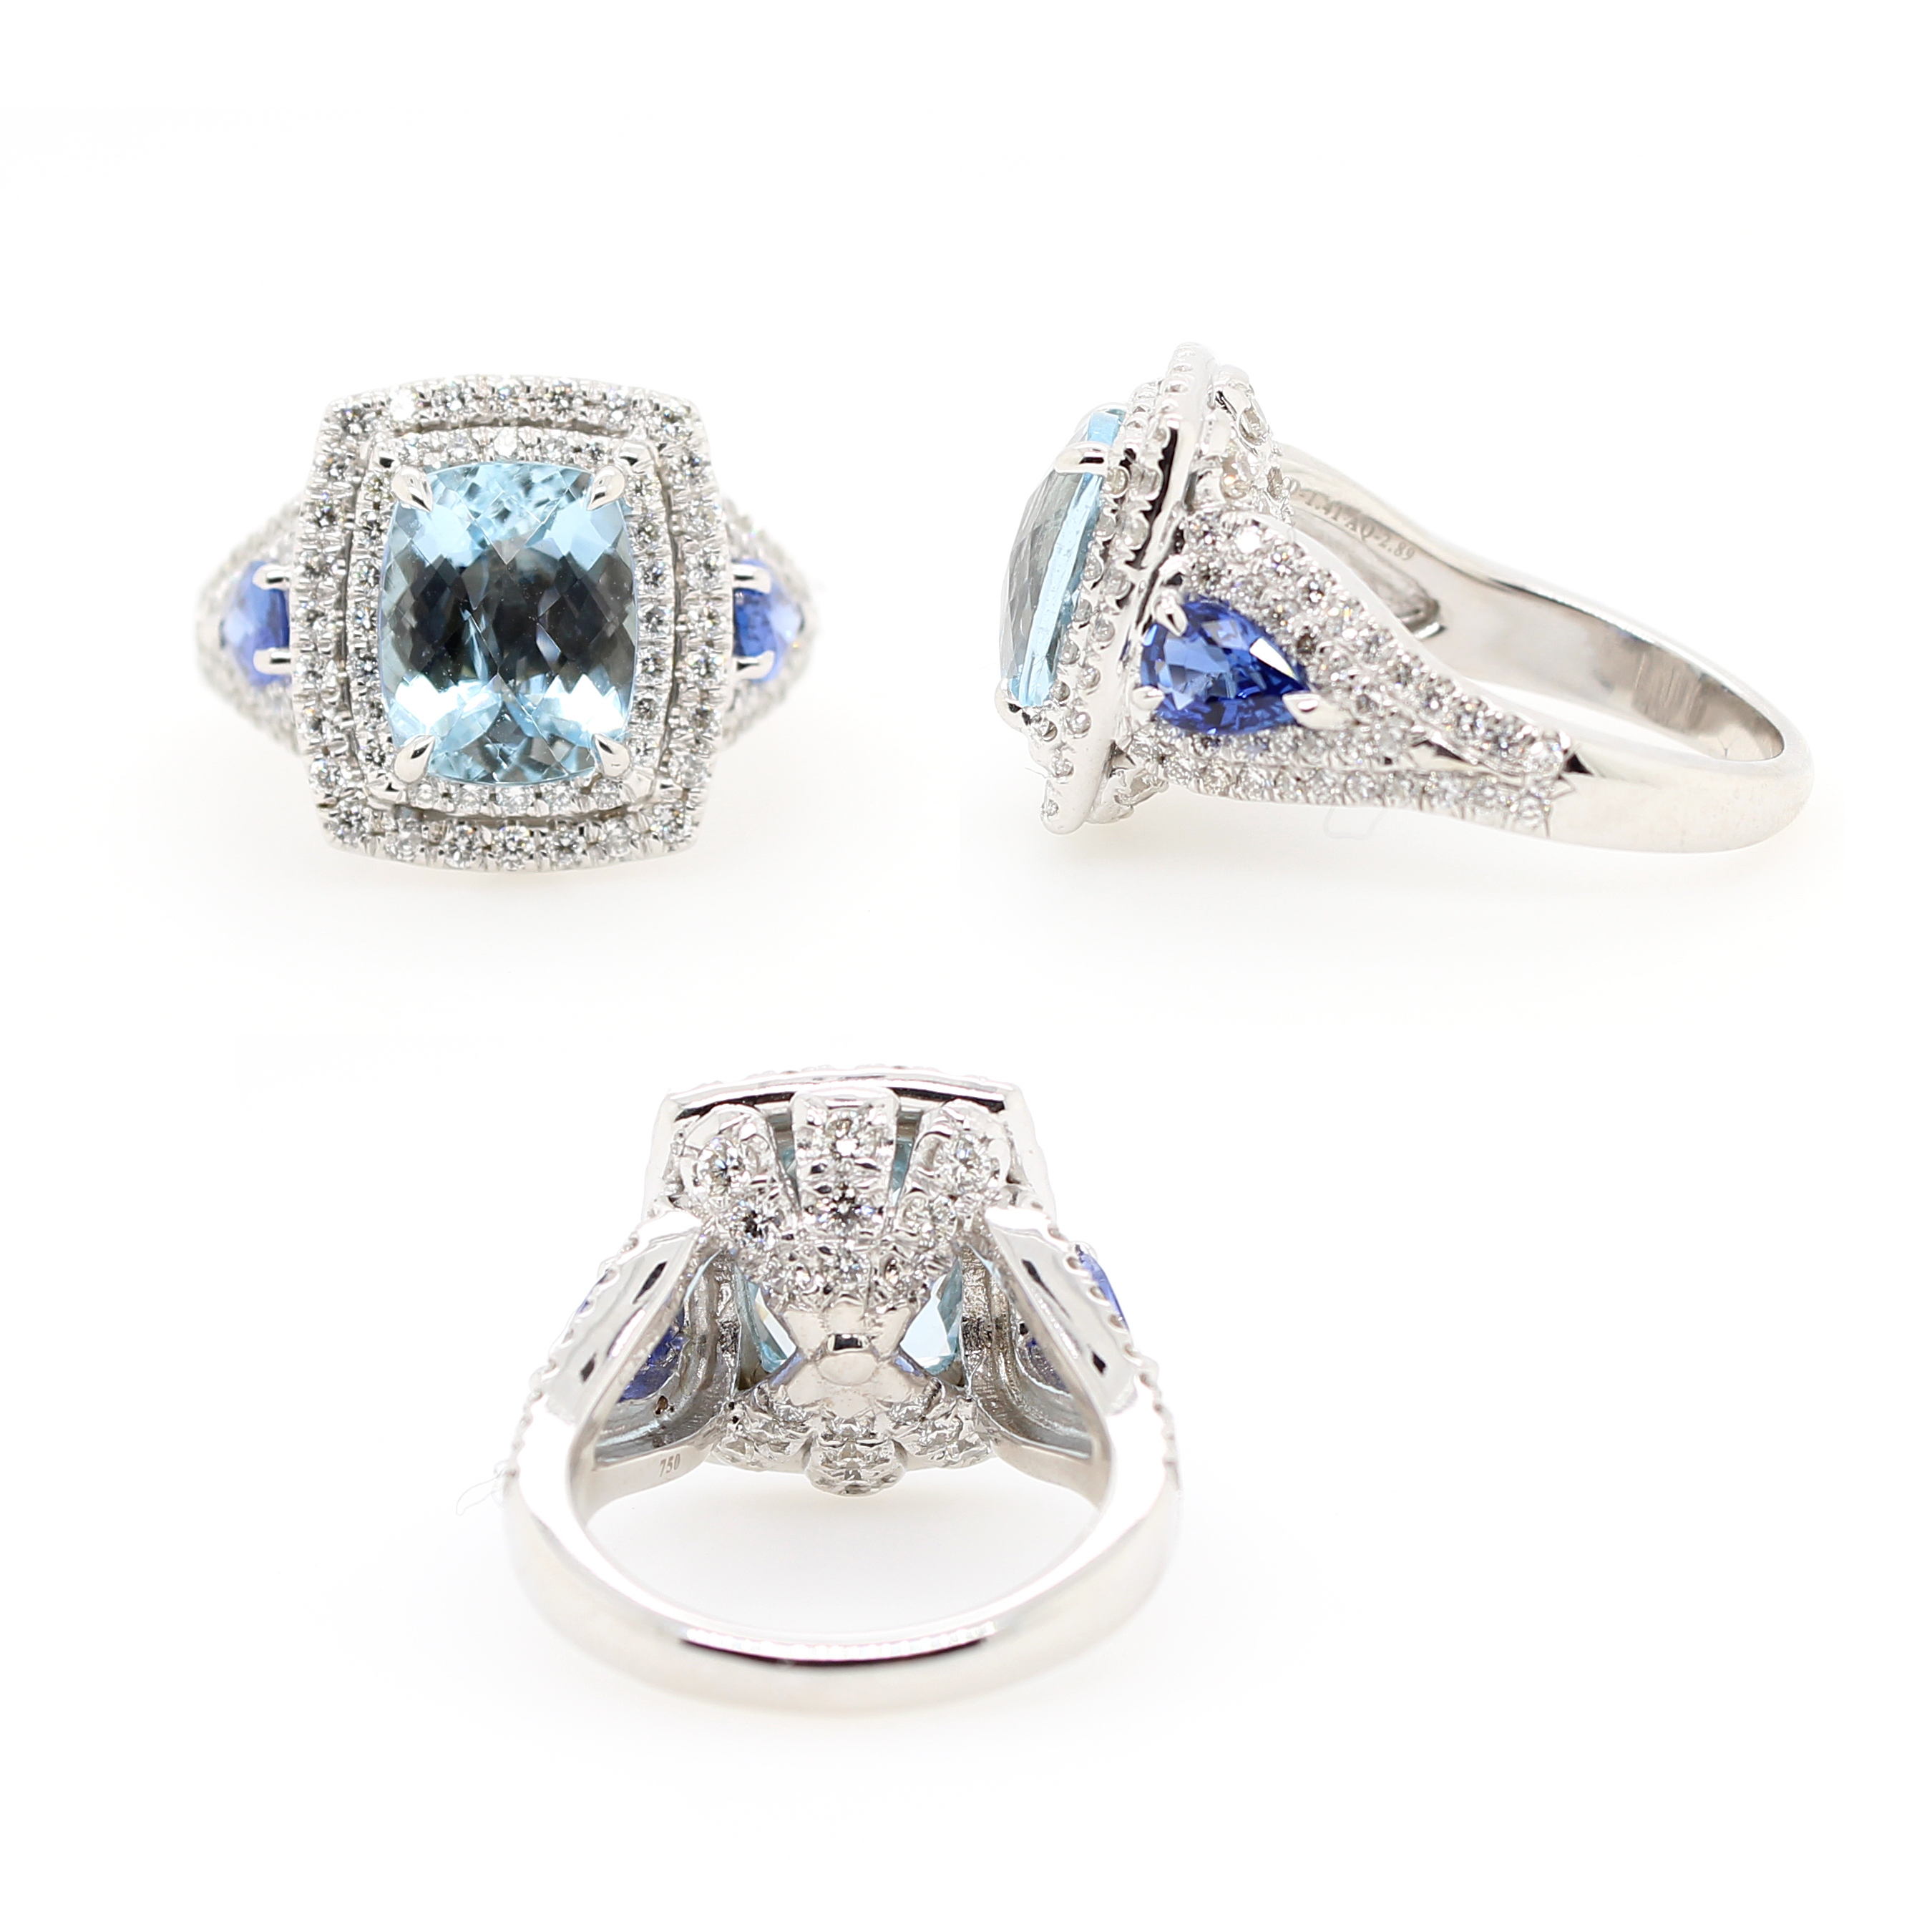 Charles Krypell 18 Karat White Gold Aquamarine, Blue Sapphire and Diamond Ring